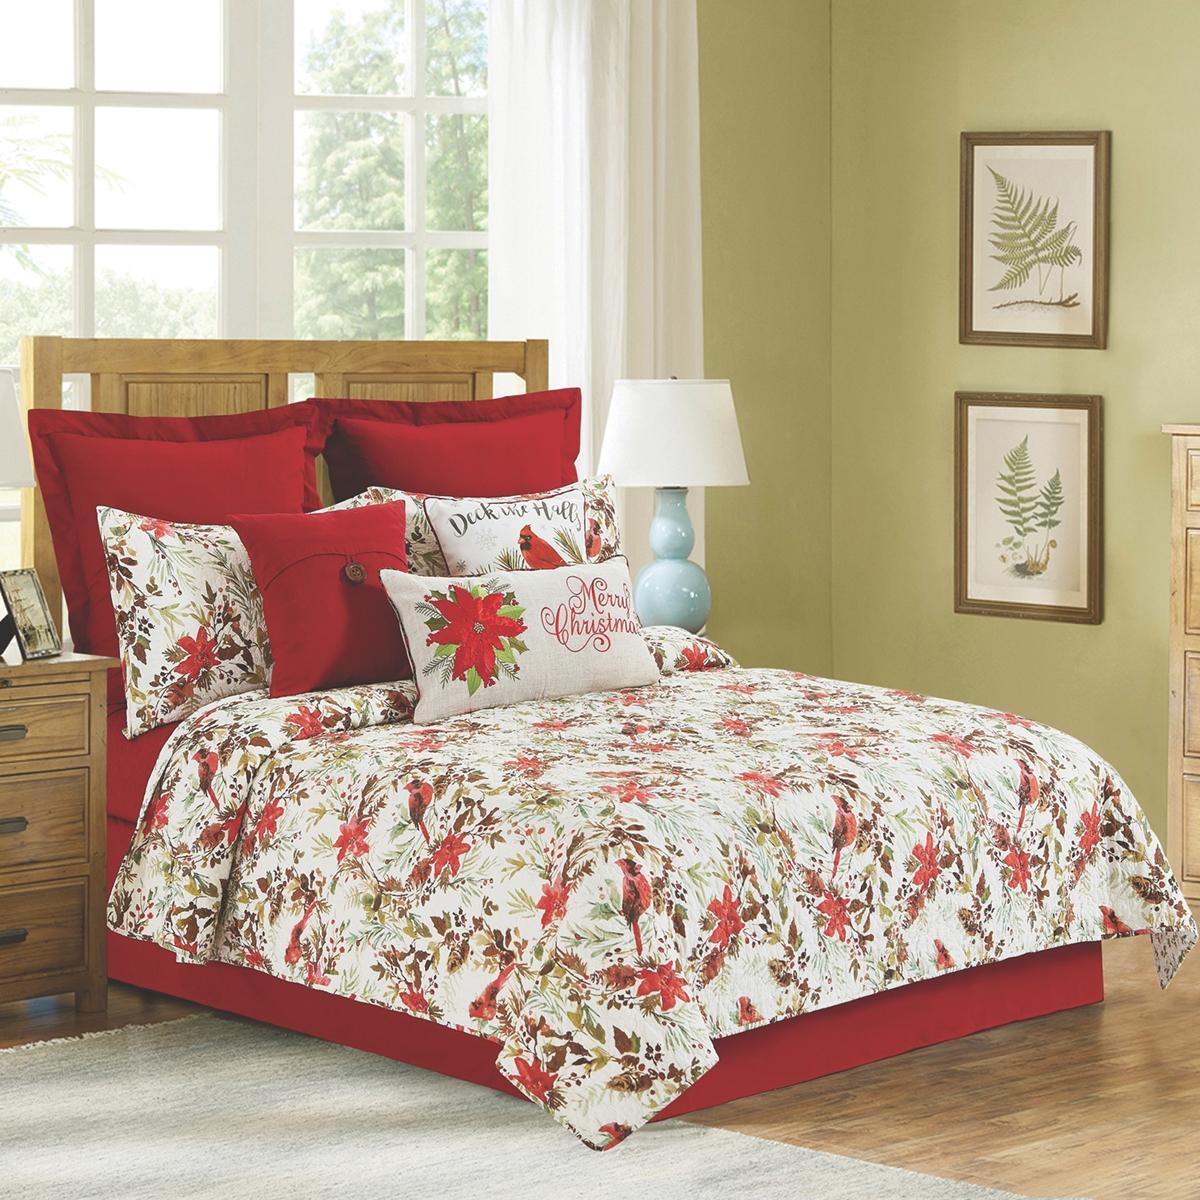 Winter Cardinals Quilted Bedding Set